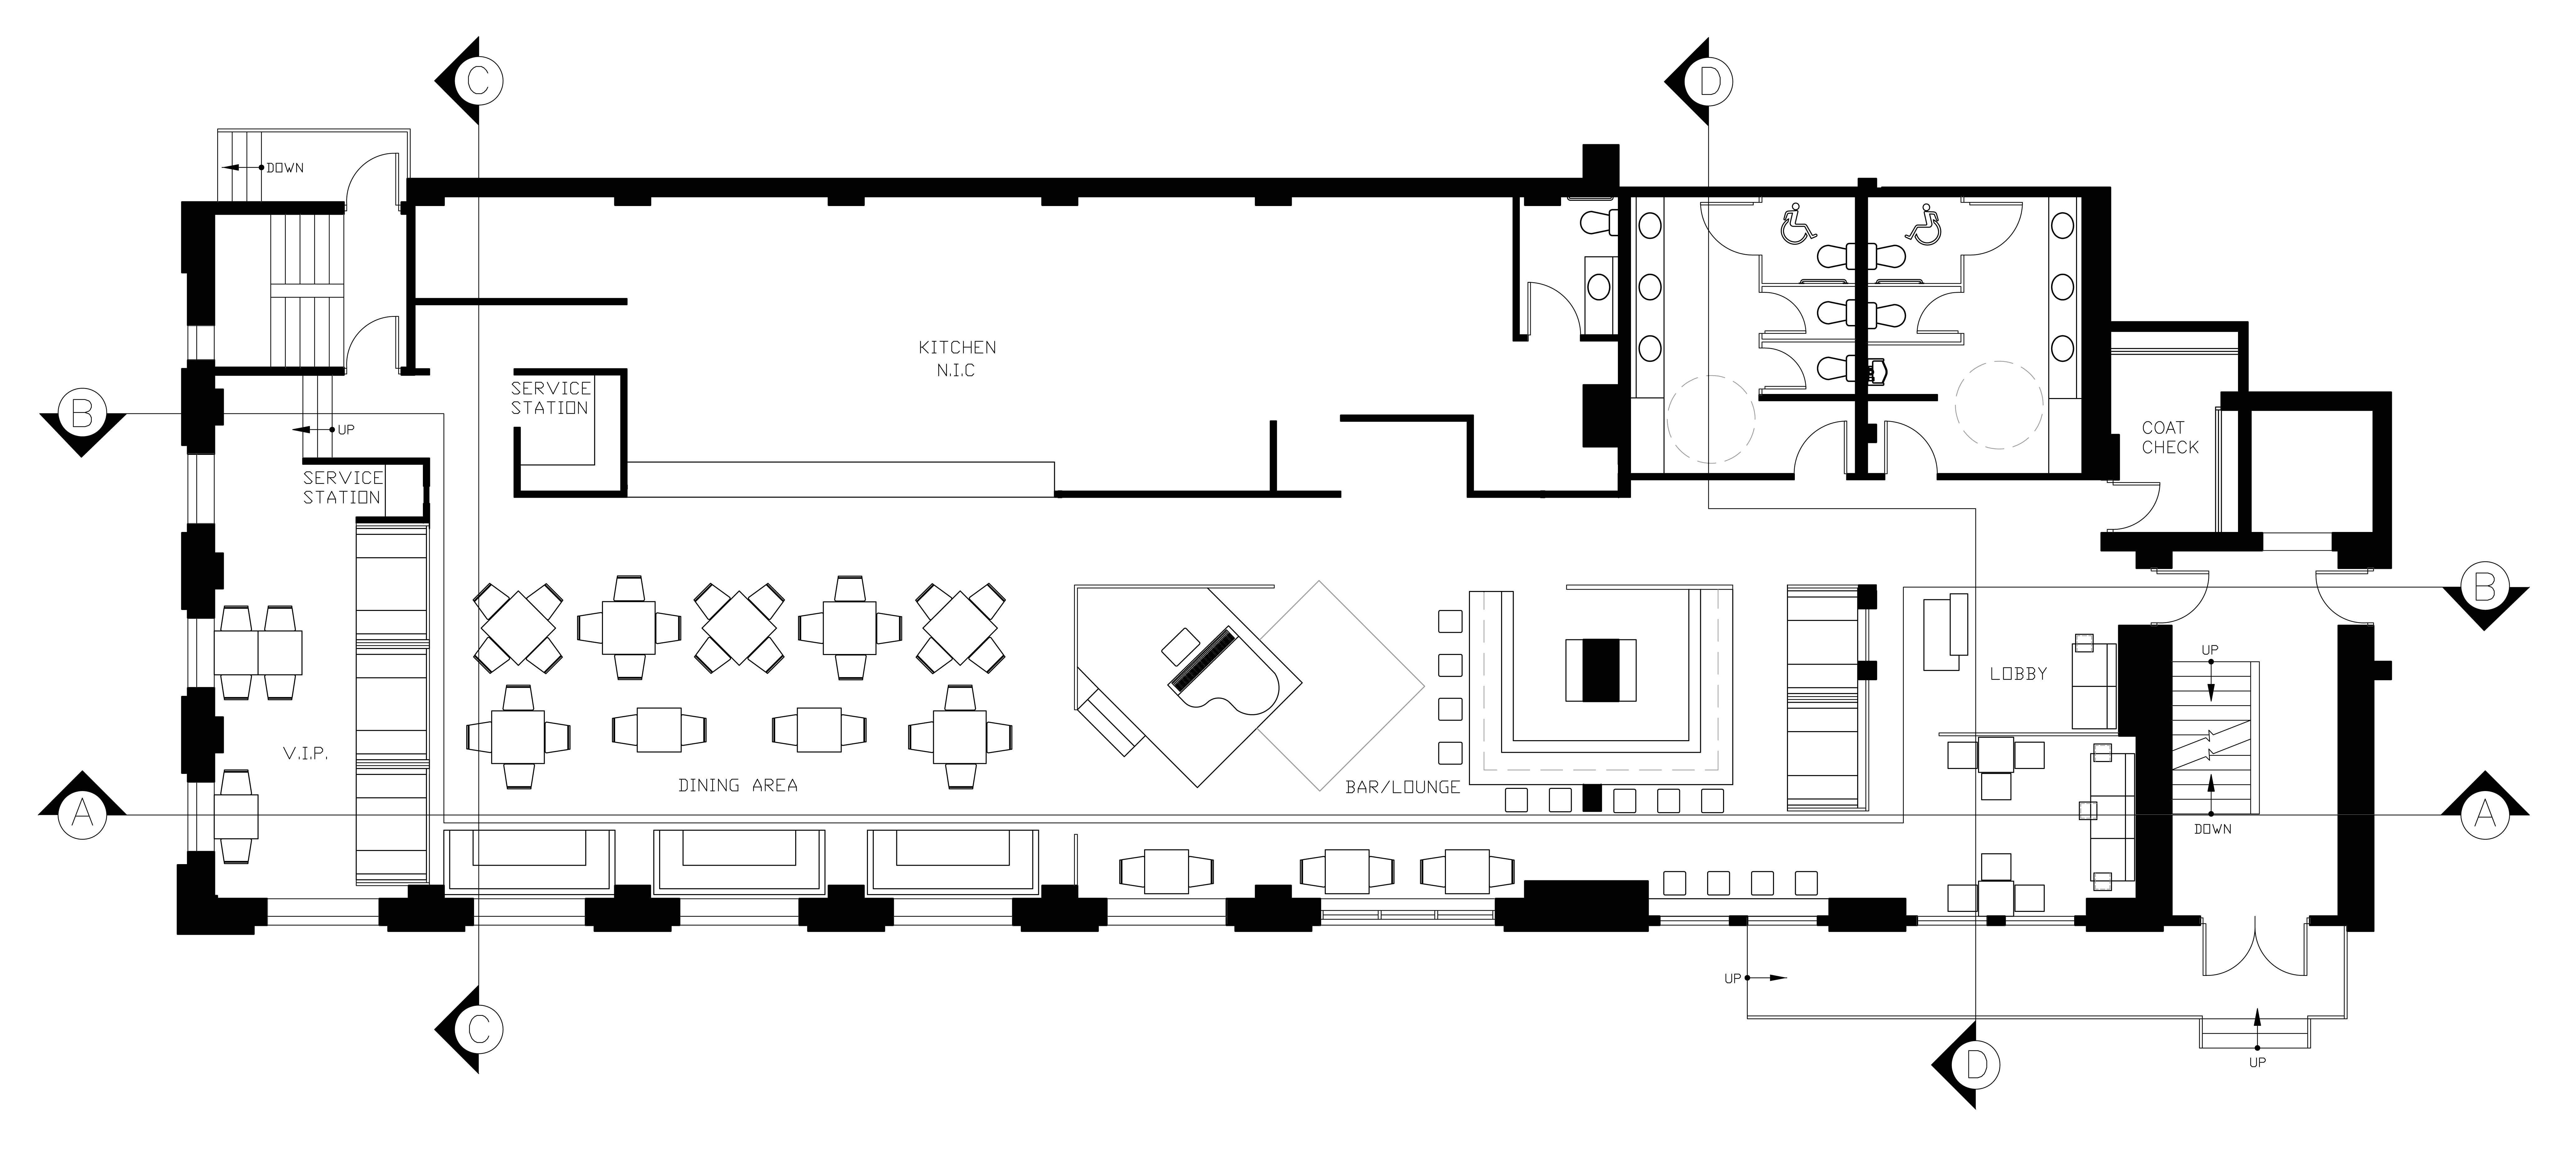 Restaurant Bar Floor Plan: Home Bar Floor Plans